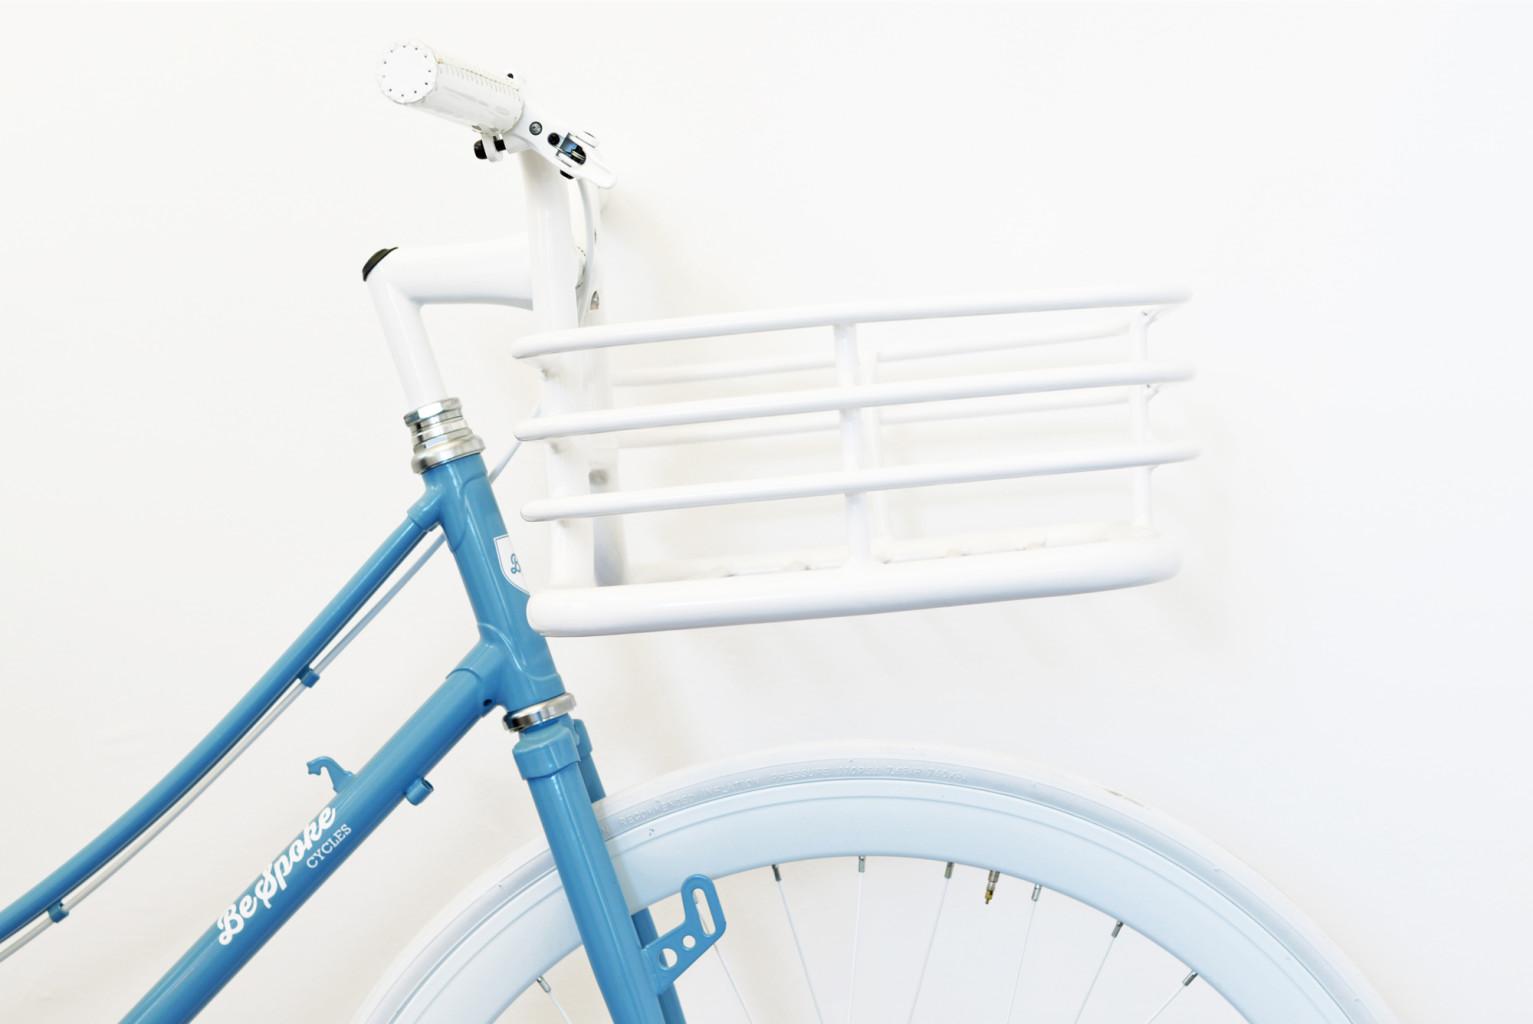 Bespoke bike 15